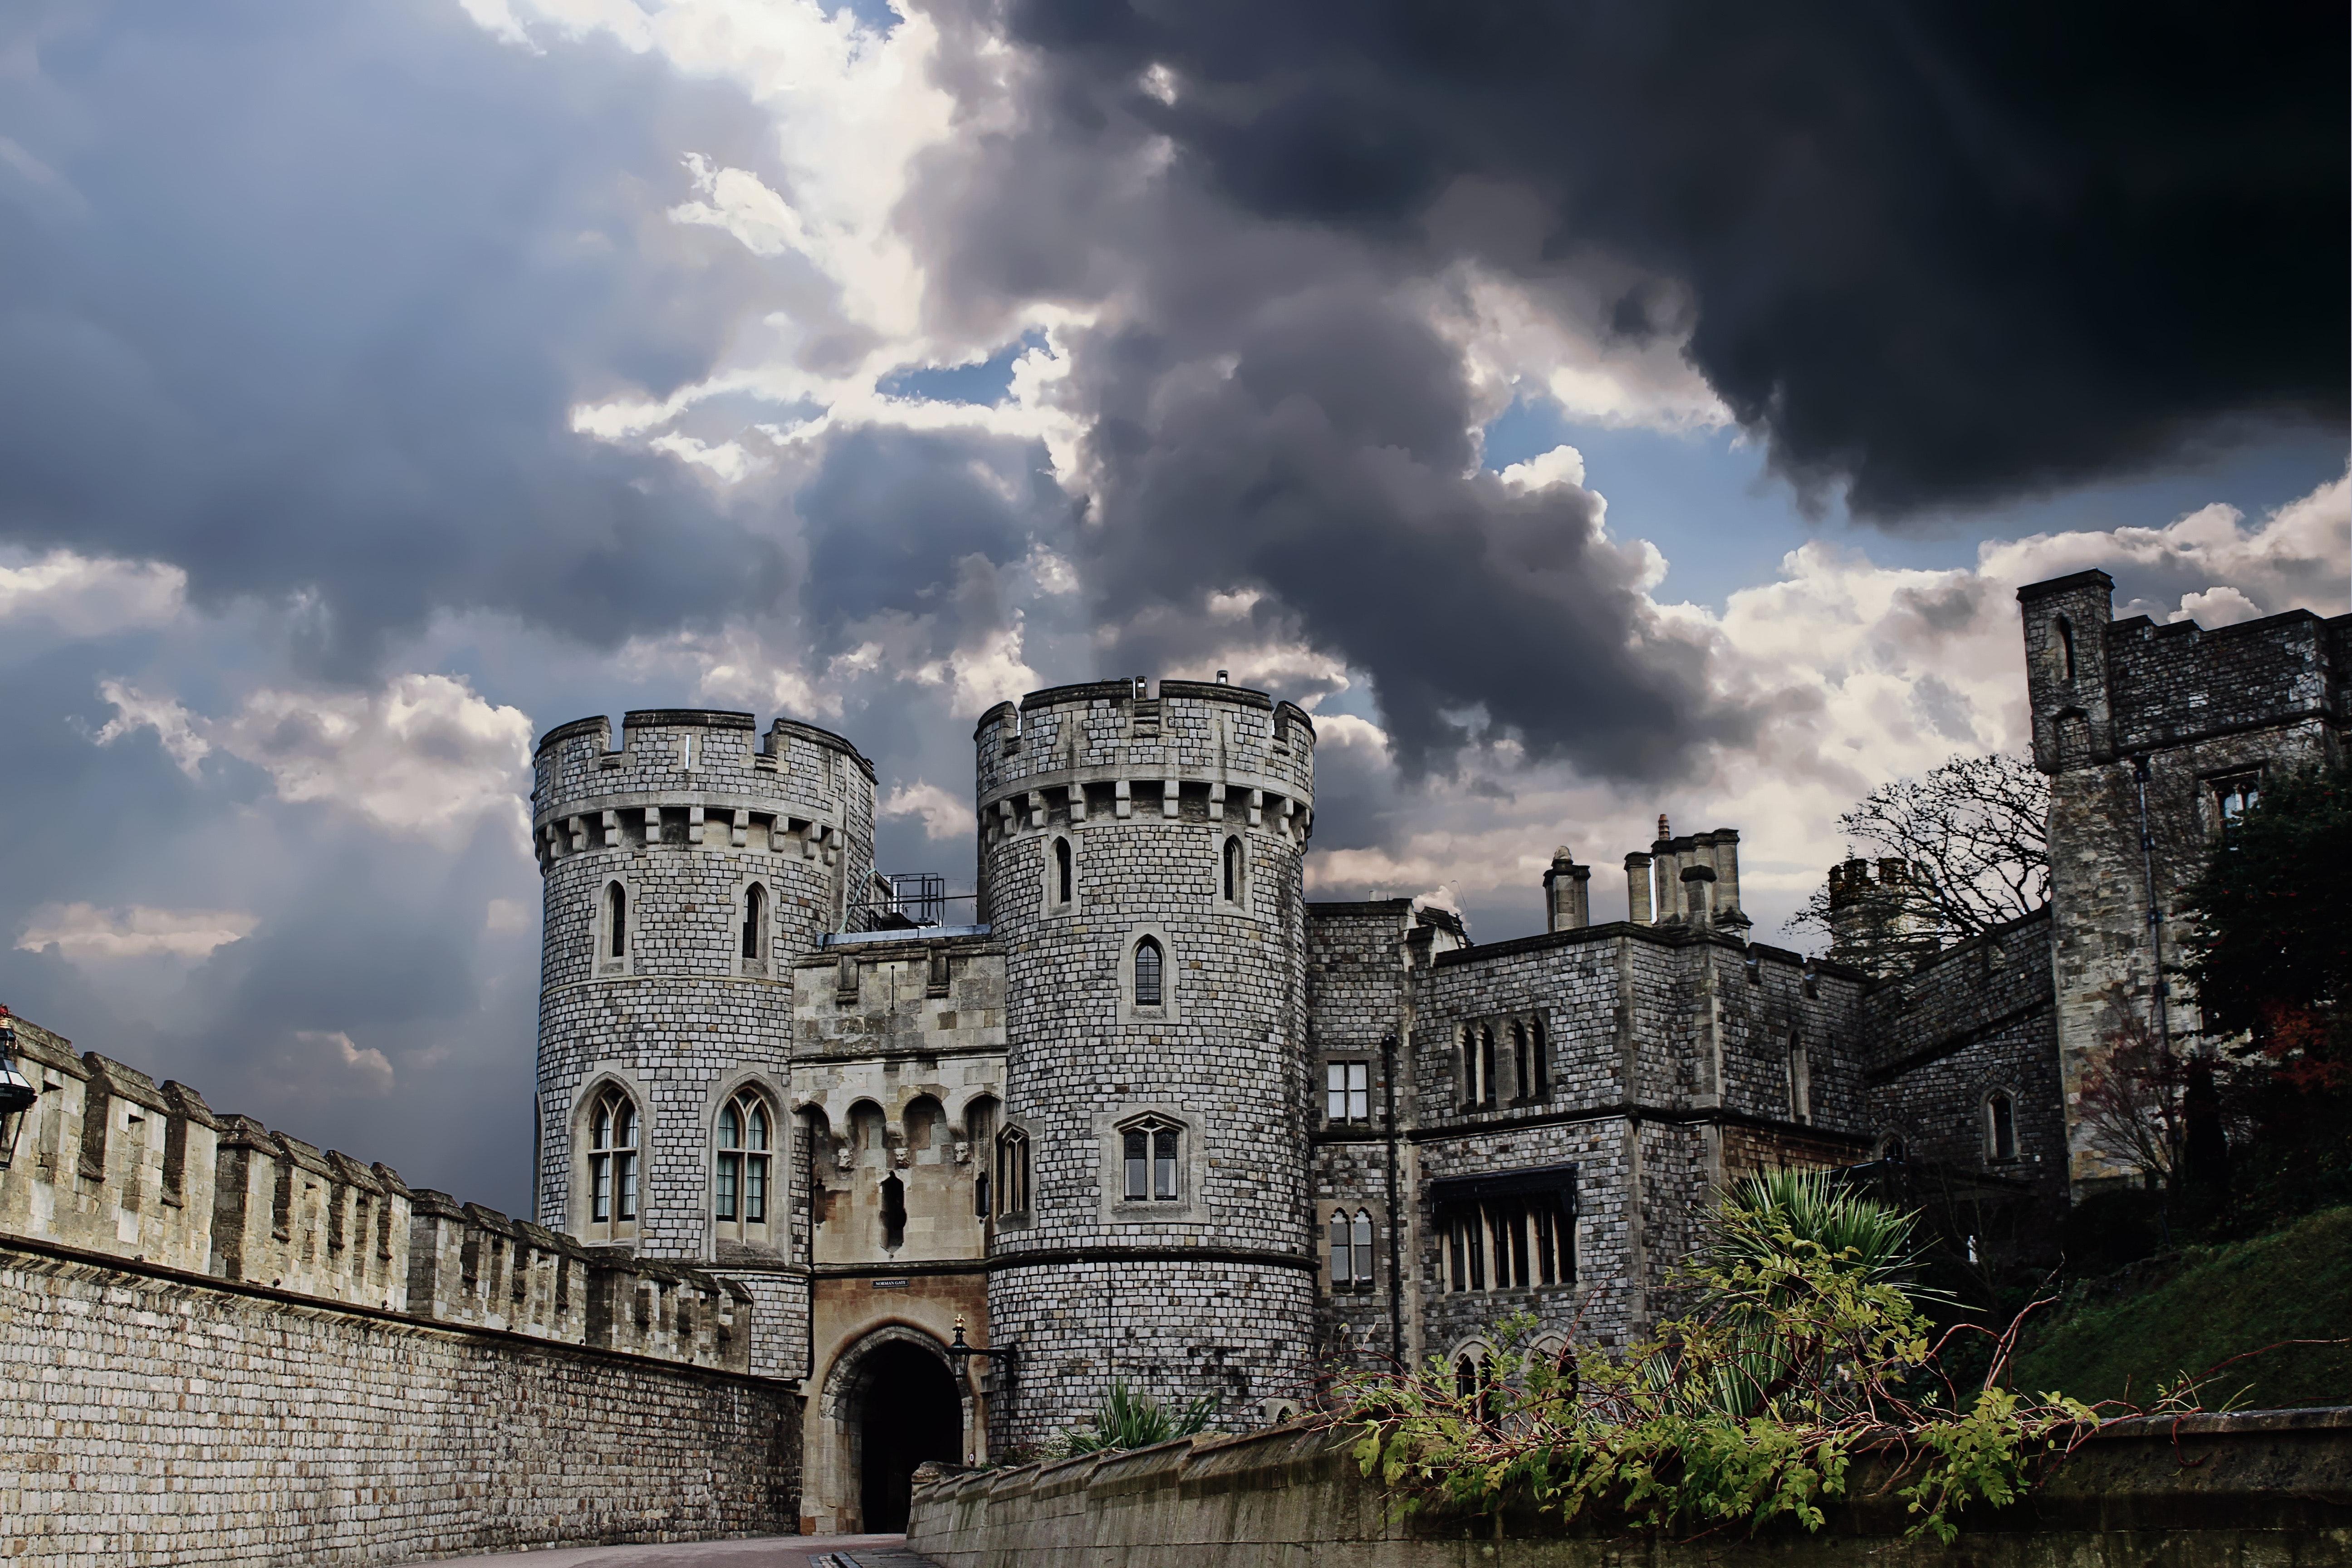 aged-architectural-design-castle-460634